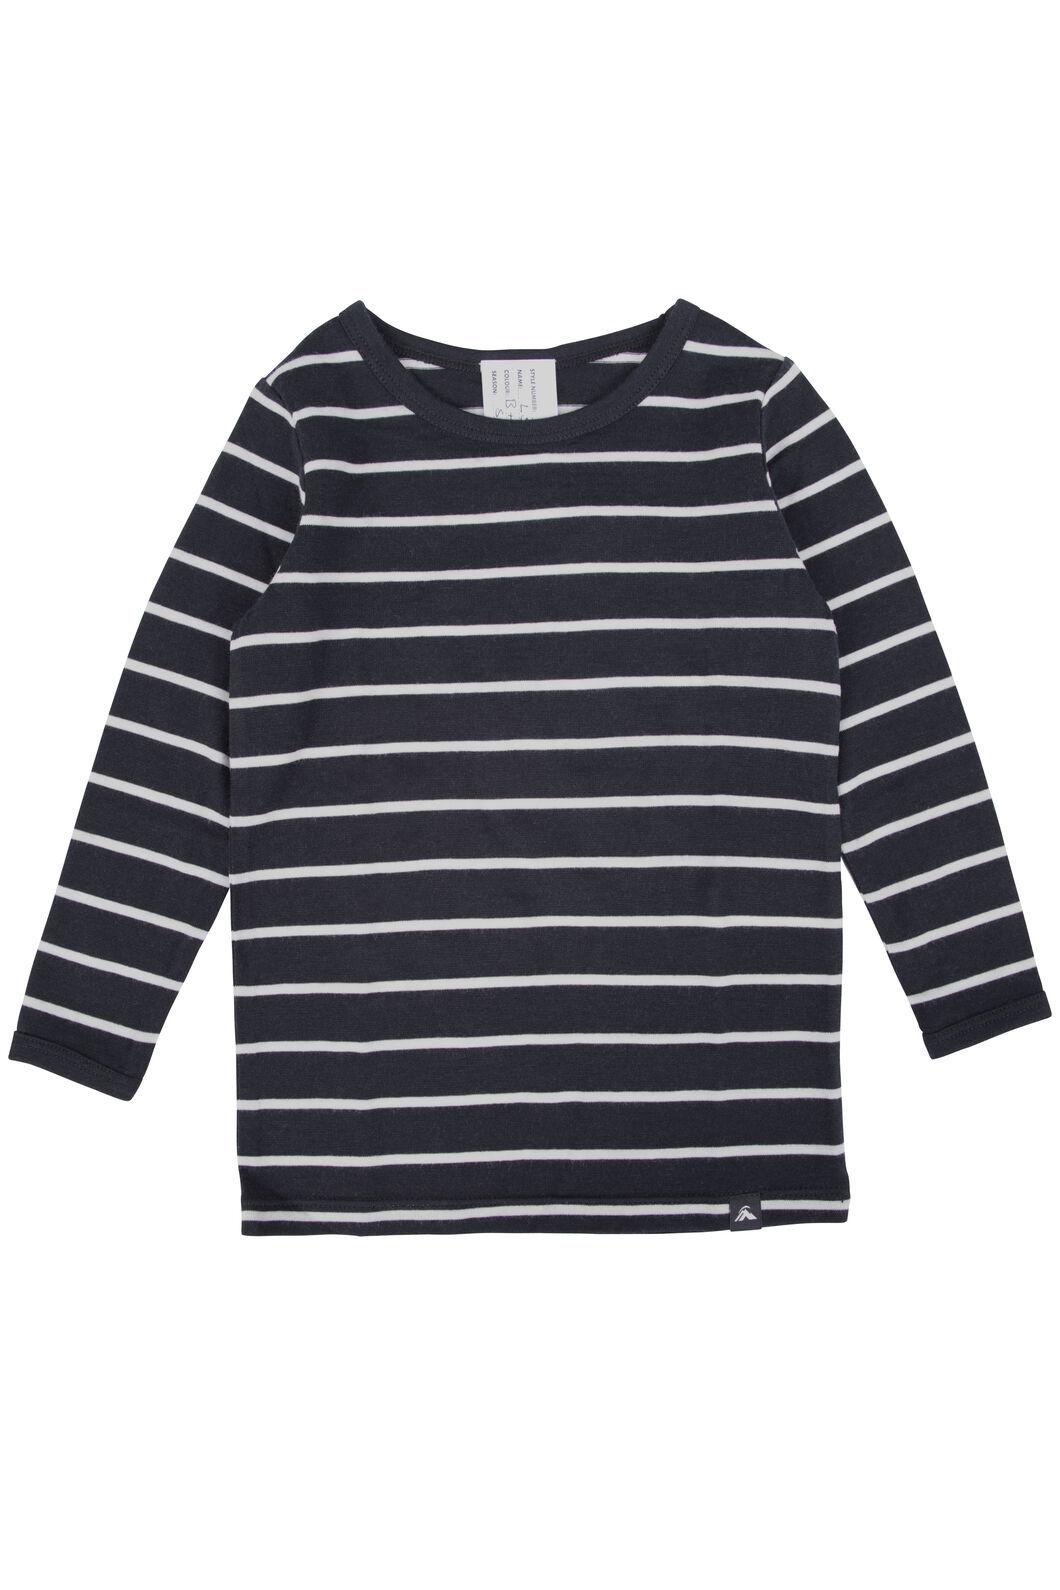 Macpac 150 Merino Long Sleeve Top — Baby, Black/White Stripe, hi-res